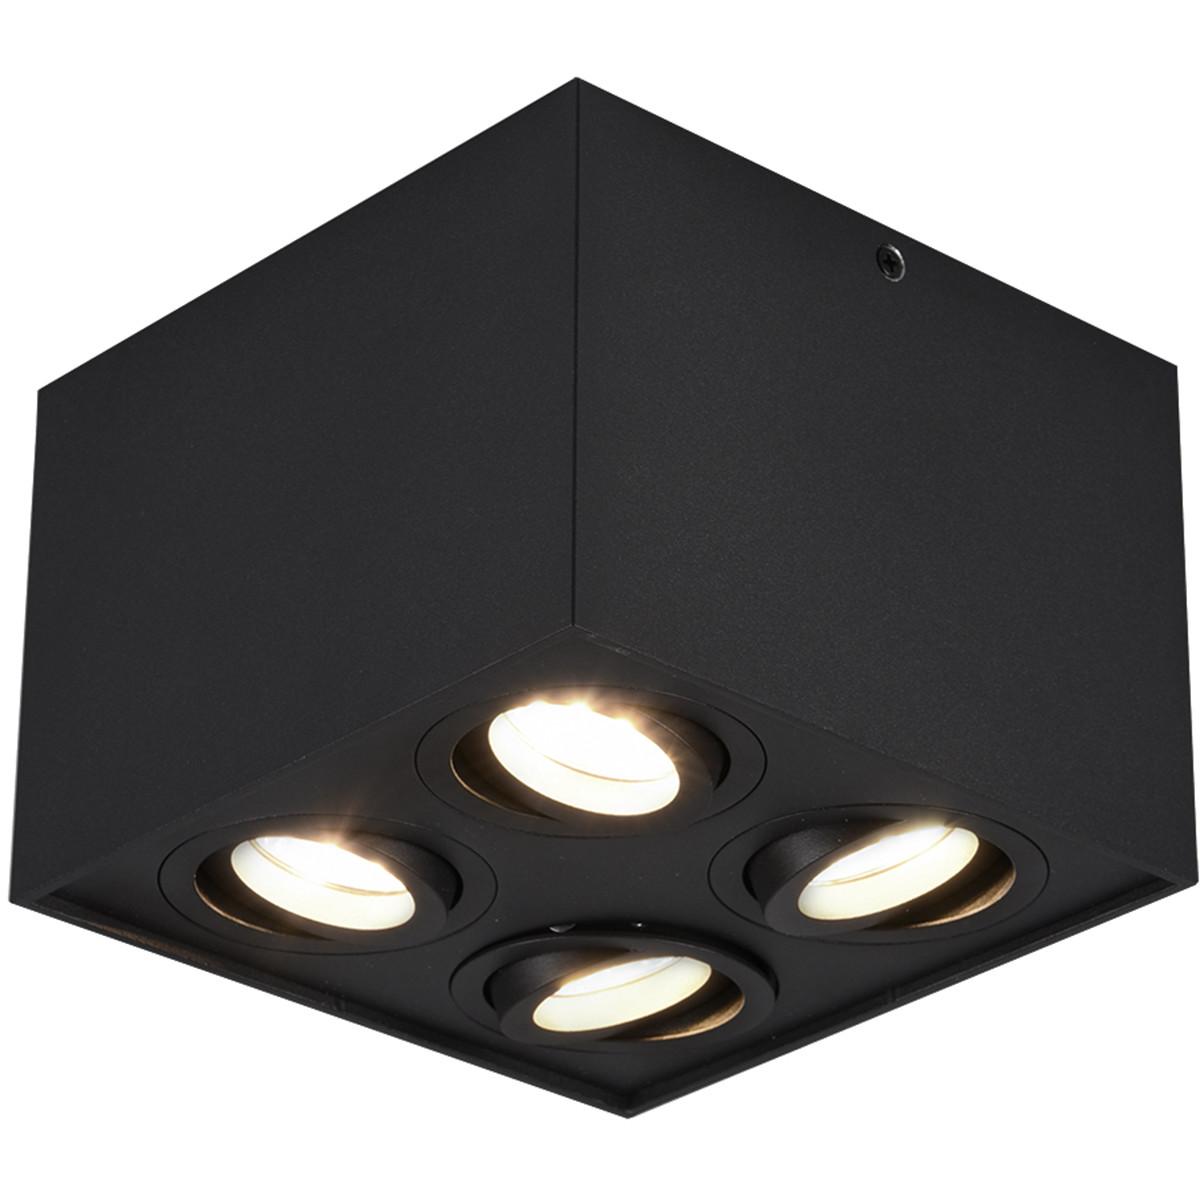 LED Plafondspot - Trion Bisqy - GU10 Fitting - 4-lichts - Vierkant - Mat Zwart - Aluminium